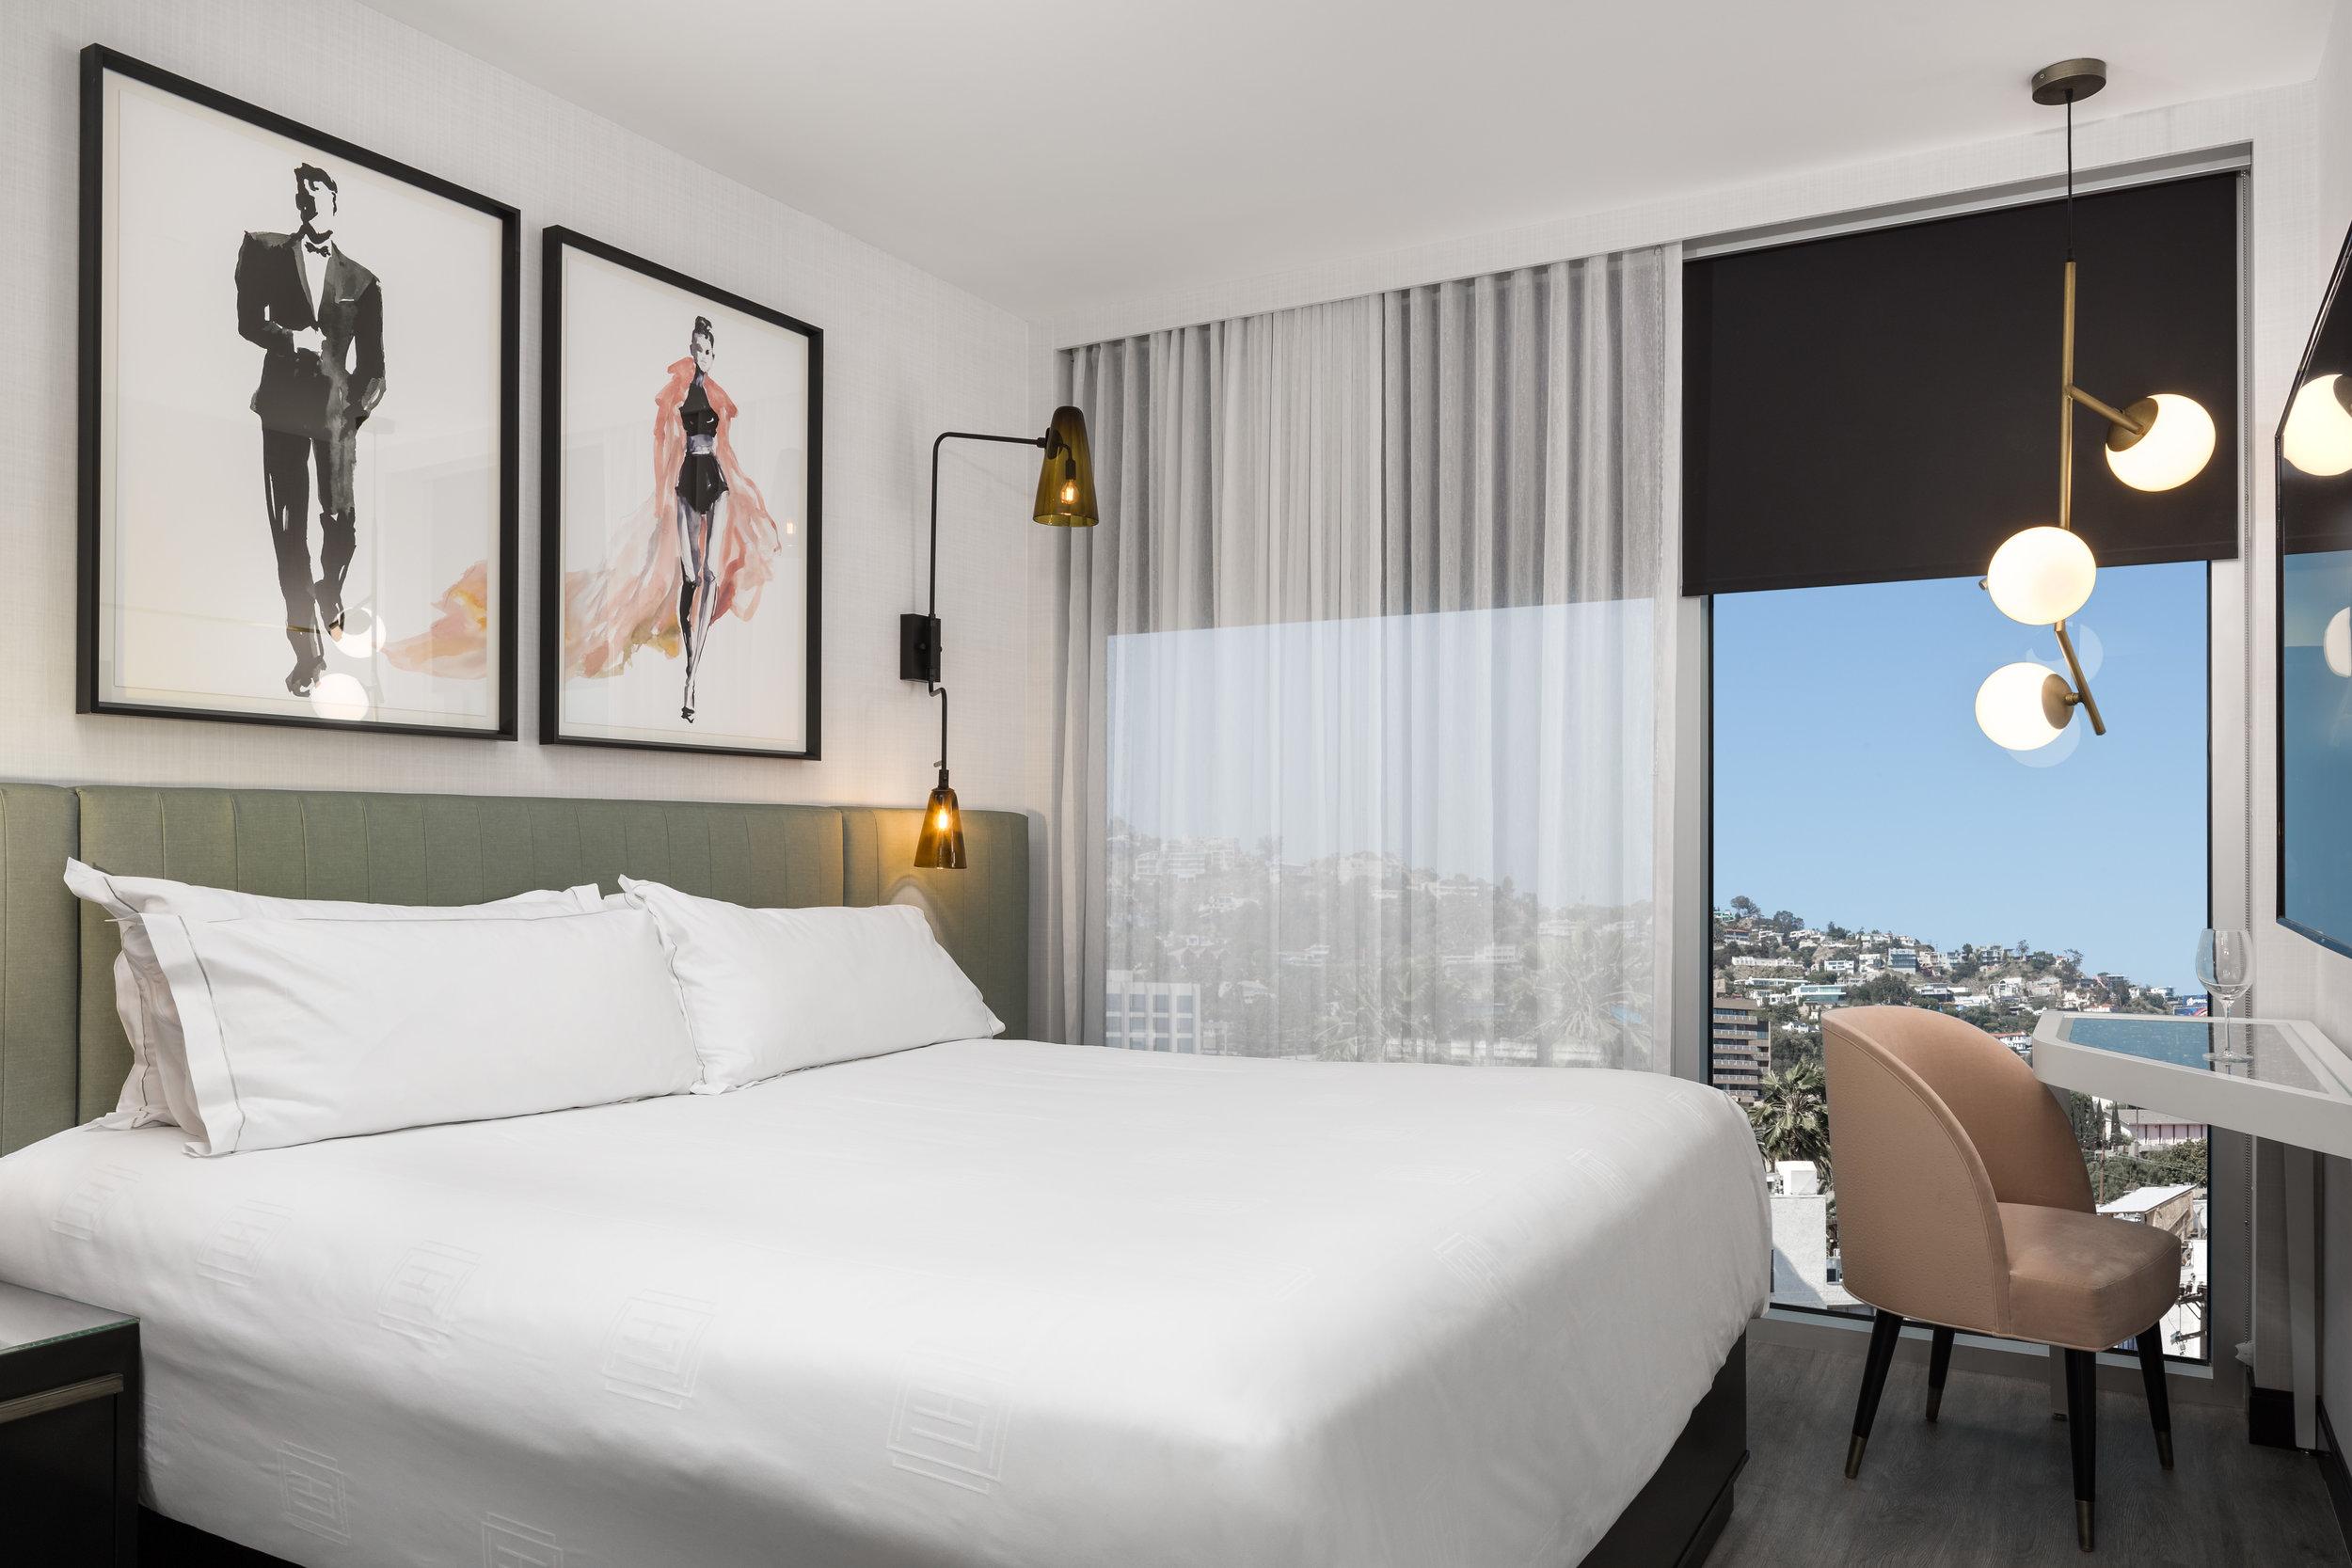 PIXELLAB_Godfrey_Hotel_-9814PXLB9814.jpg